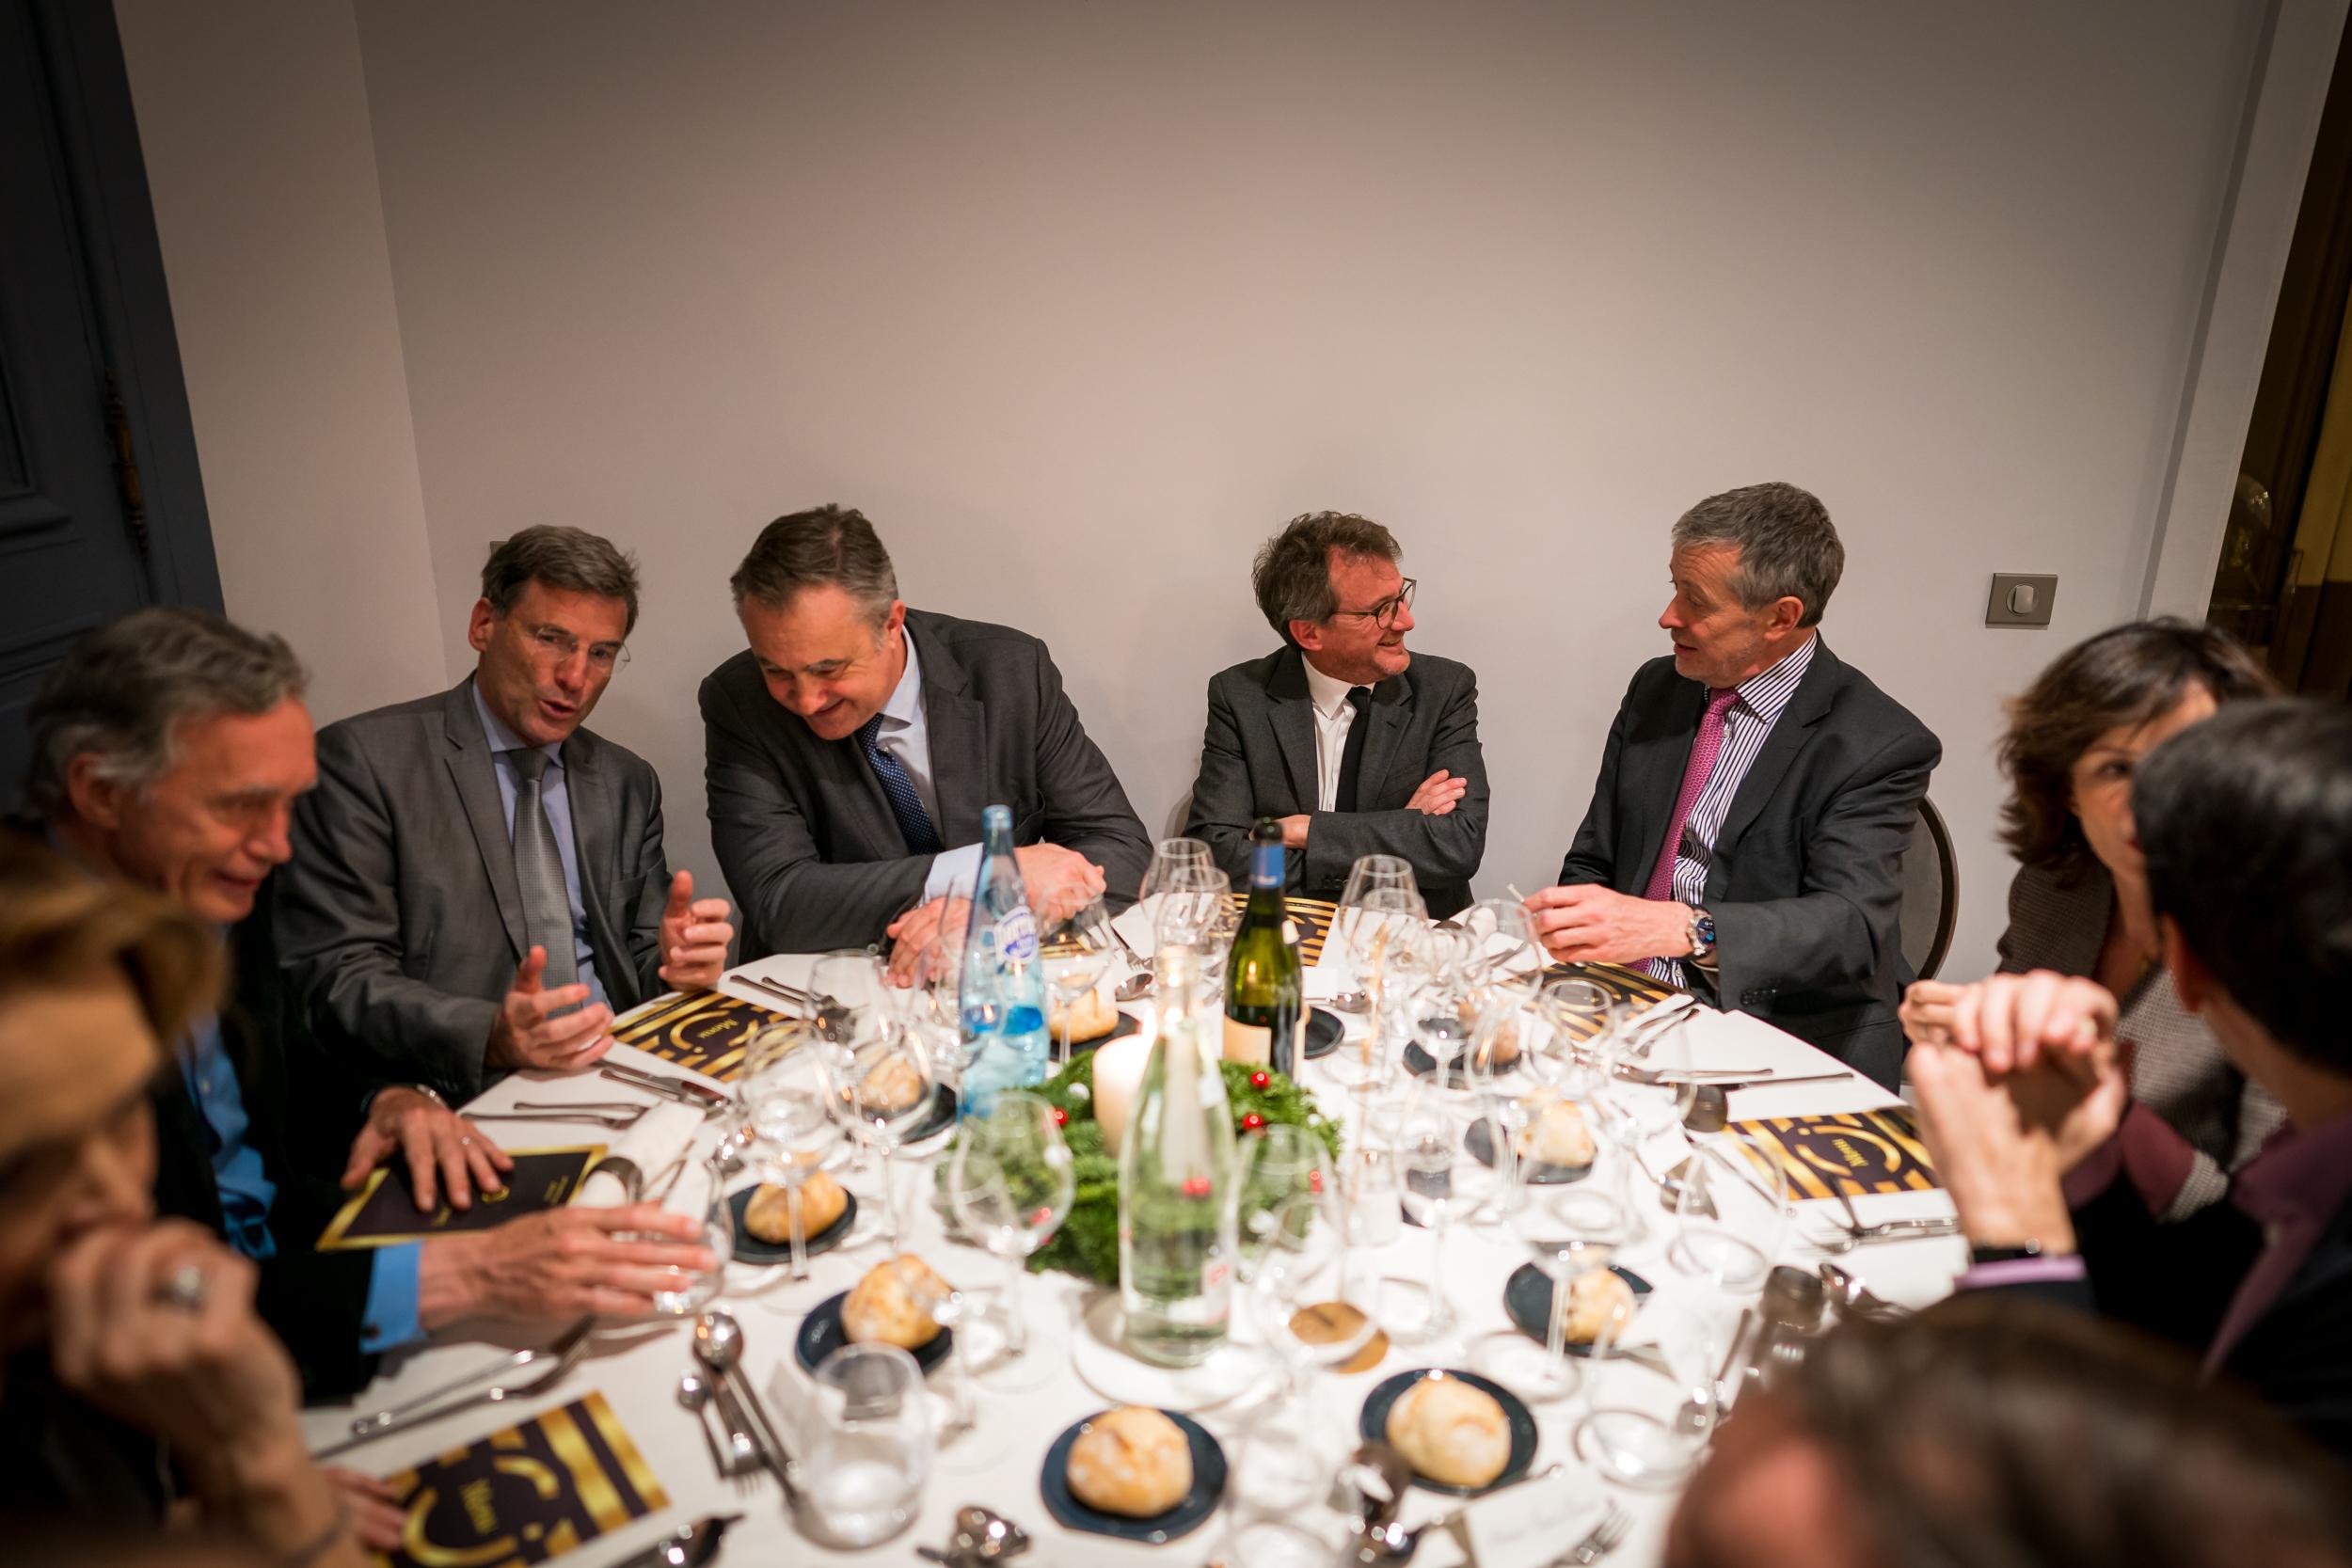 Le Club des Juristes_Diner de Noël _14-12-18 _ Florian Leger_SHARE & DARE_ HD_ N°-142.jpg